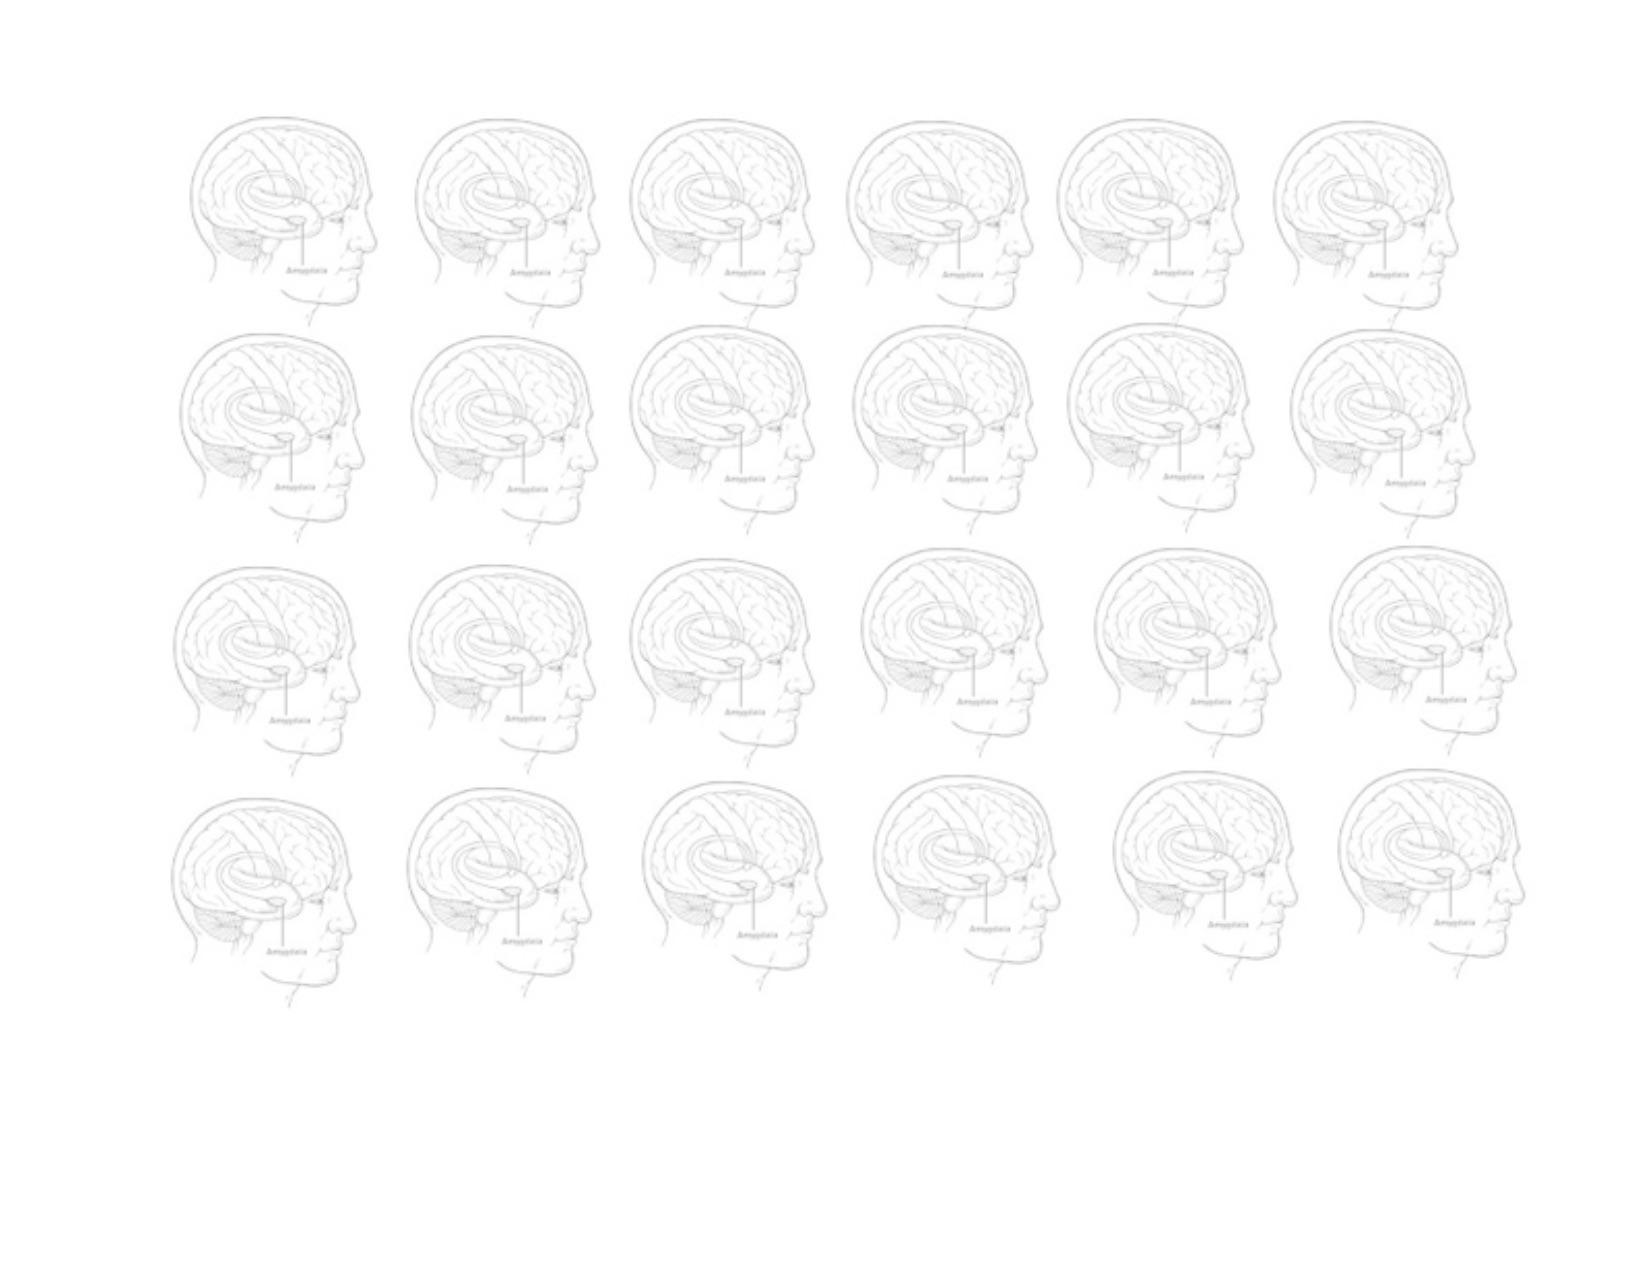 amygdala group BW.jpg